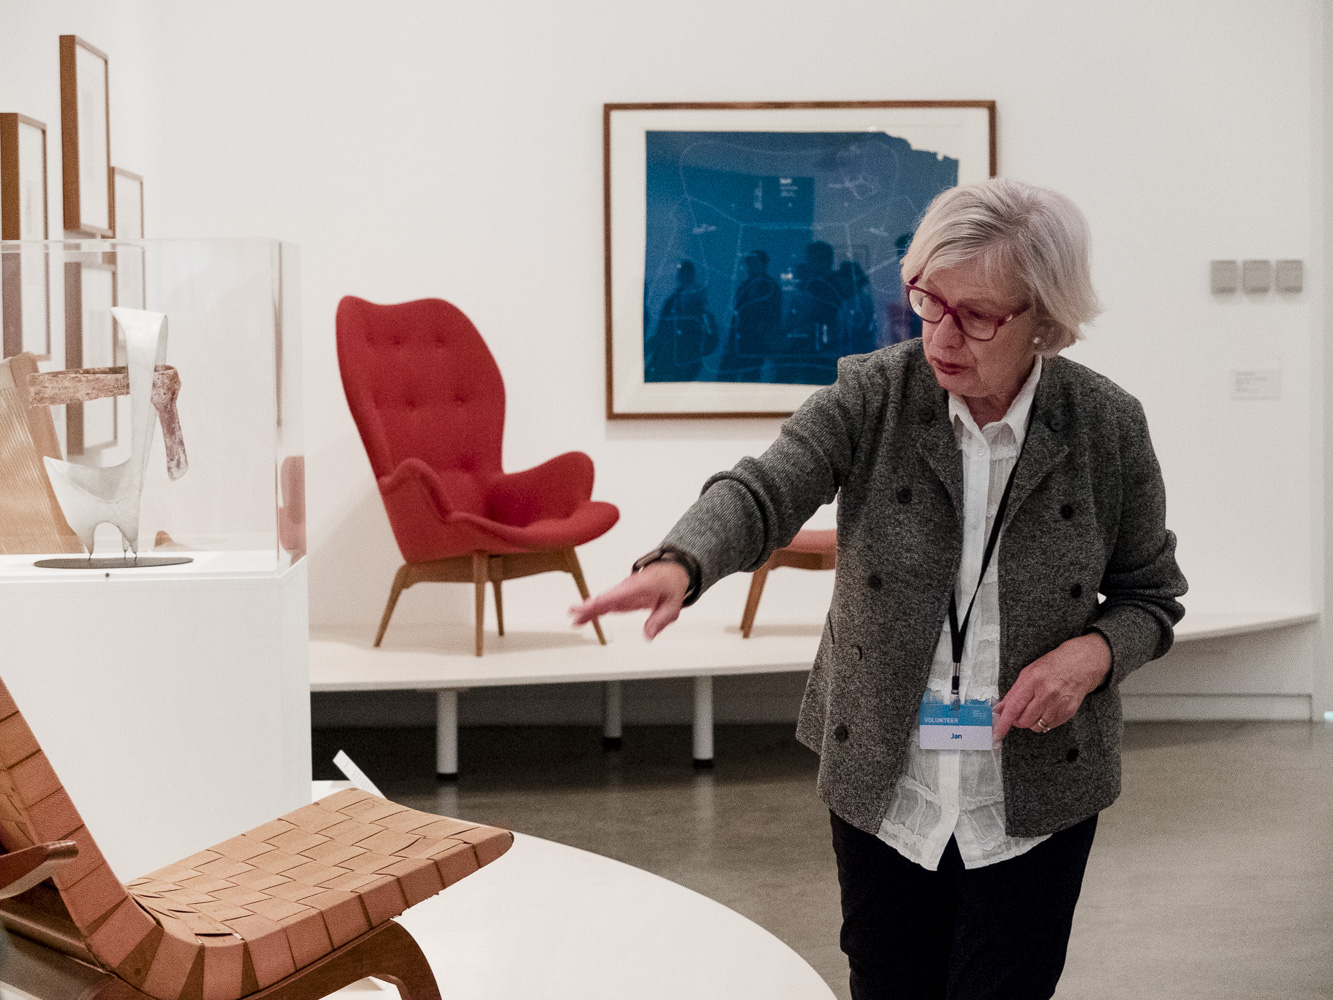 Heide Featherston Exhibition Cantilever Interiors Furniture Design (12).JPG